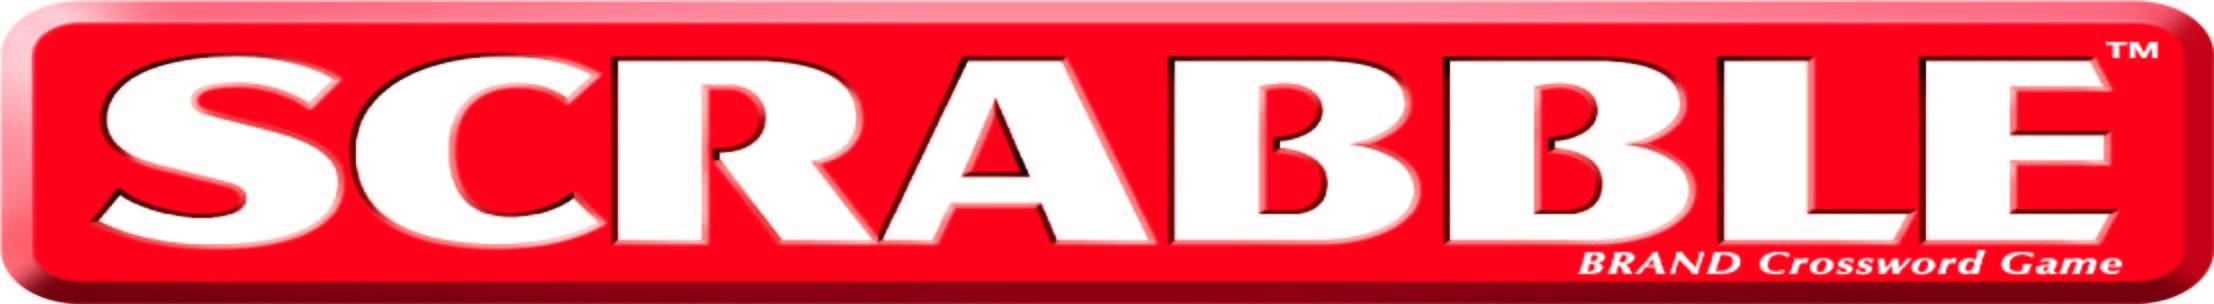 Scrabble Logo photo - 1